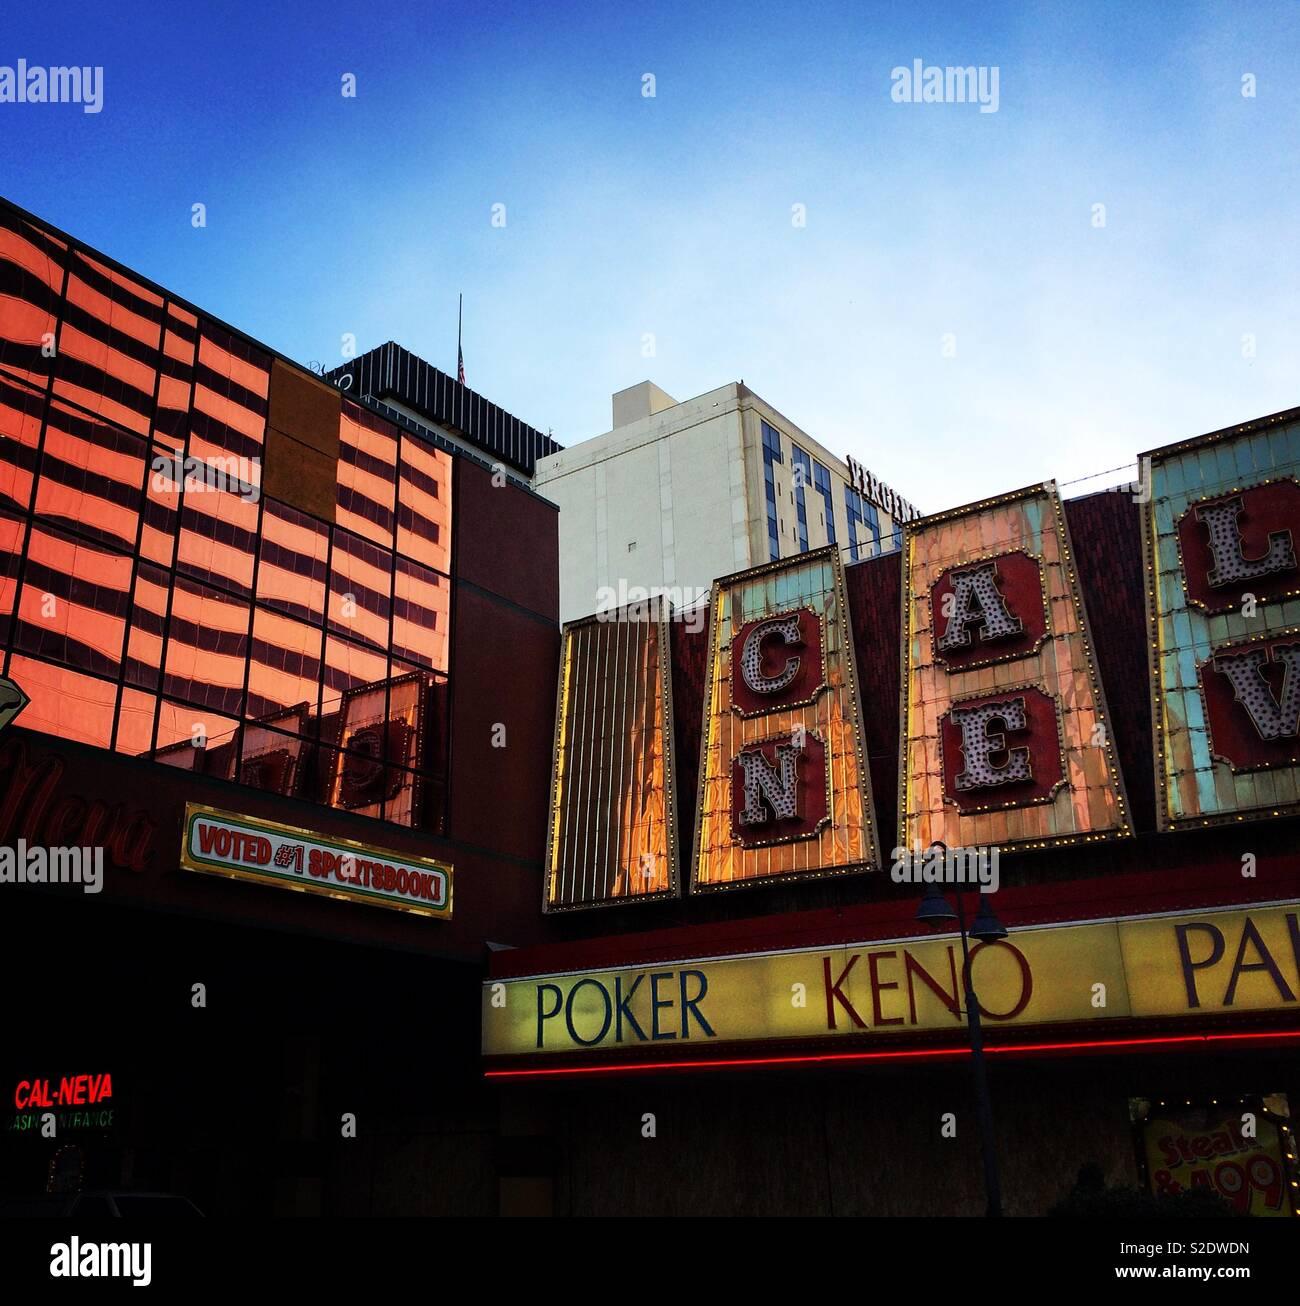 Club Cal Neva, Downtown Reno, Nevada, United States - Stock Image